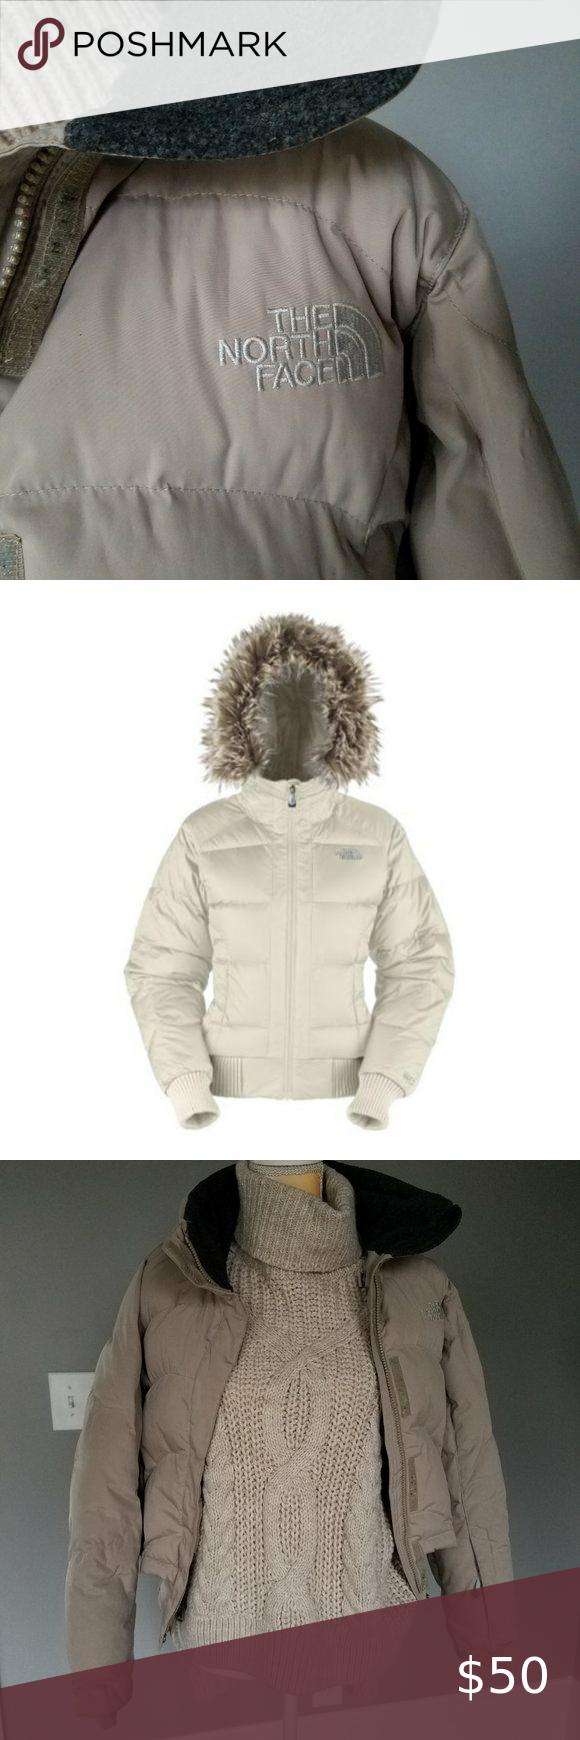 North Face Coat Ski Jacket Beige Small S Hooded North Face Coat Ski Jacket Jacket Design [ 1740 x 580 Pixel ]